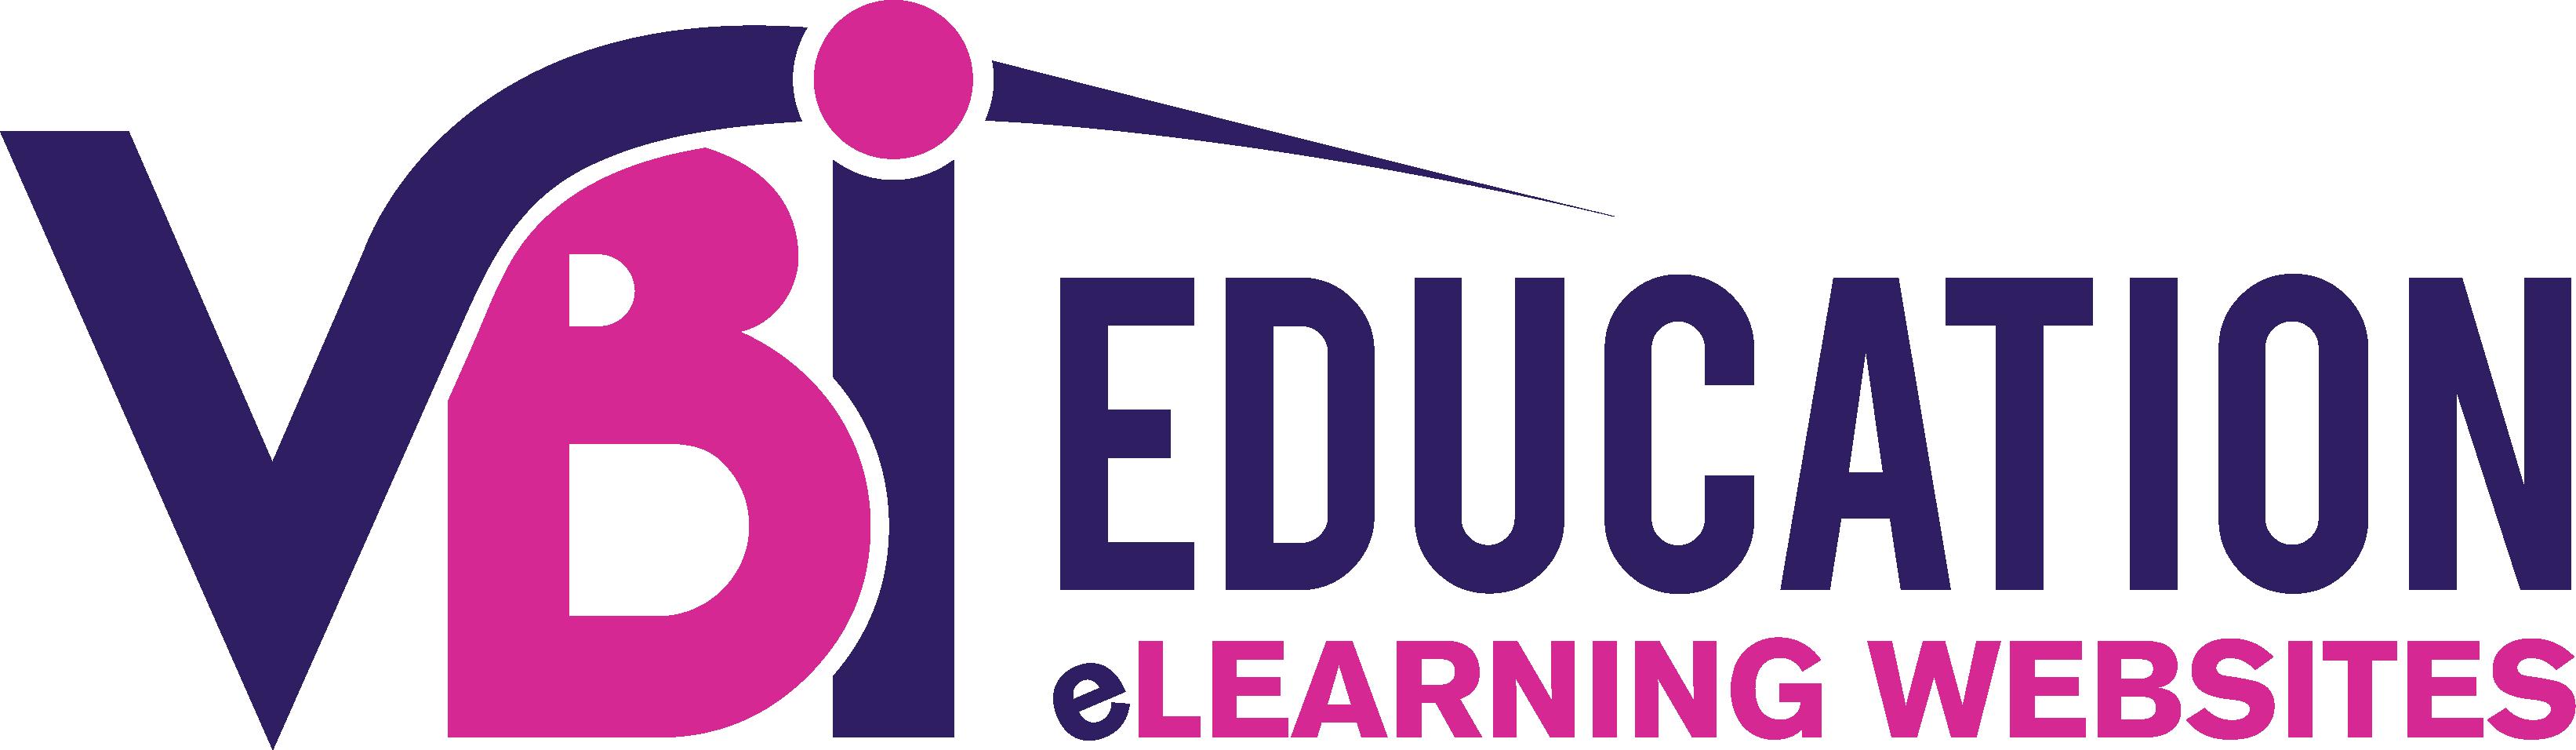 eLearning Websites